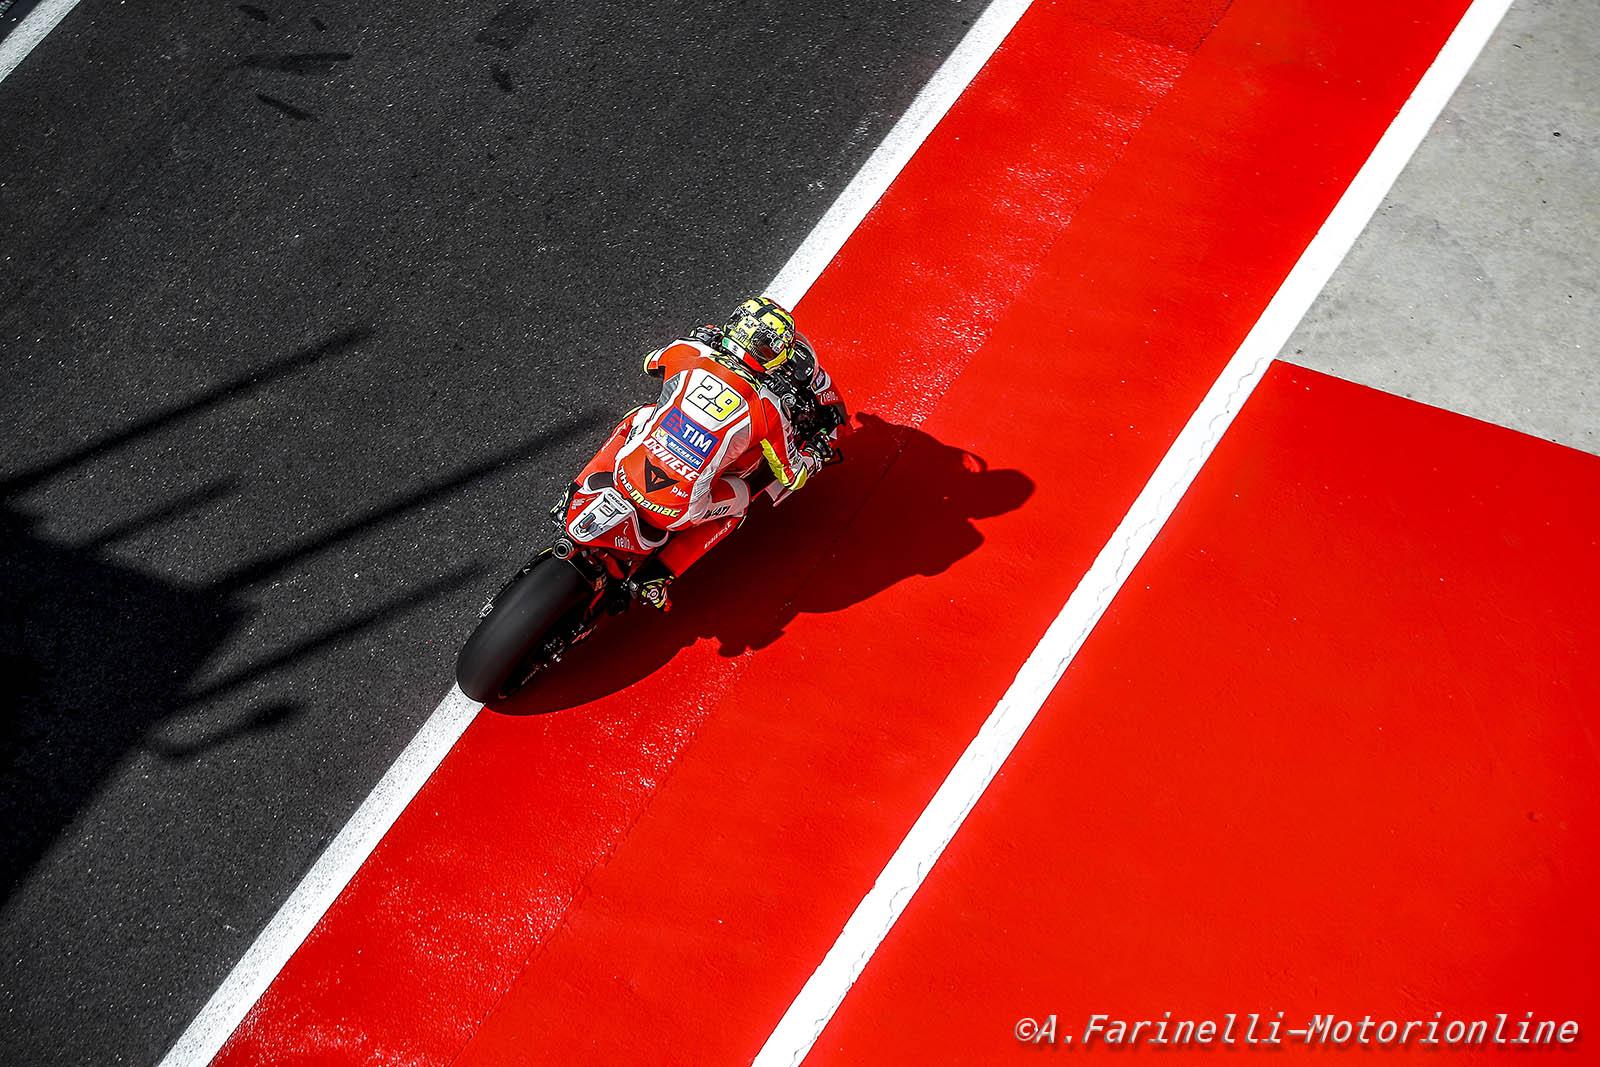 MotoGP Sepang 2016Day_2 Foto MotoGP alta risoluzione 20 di 68